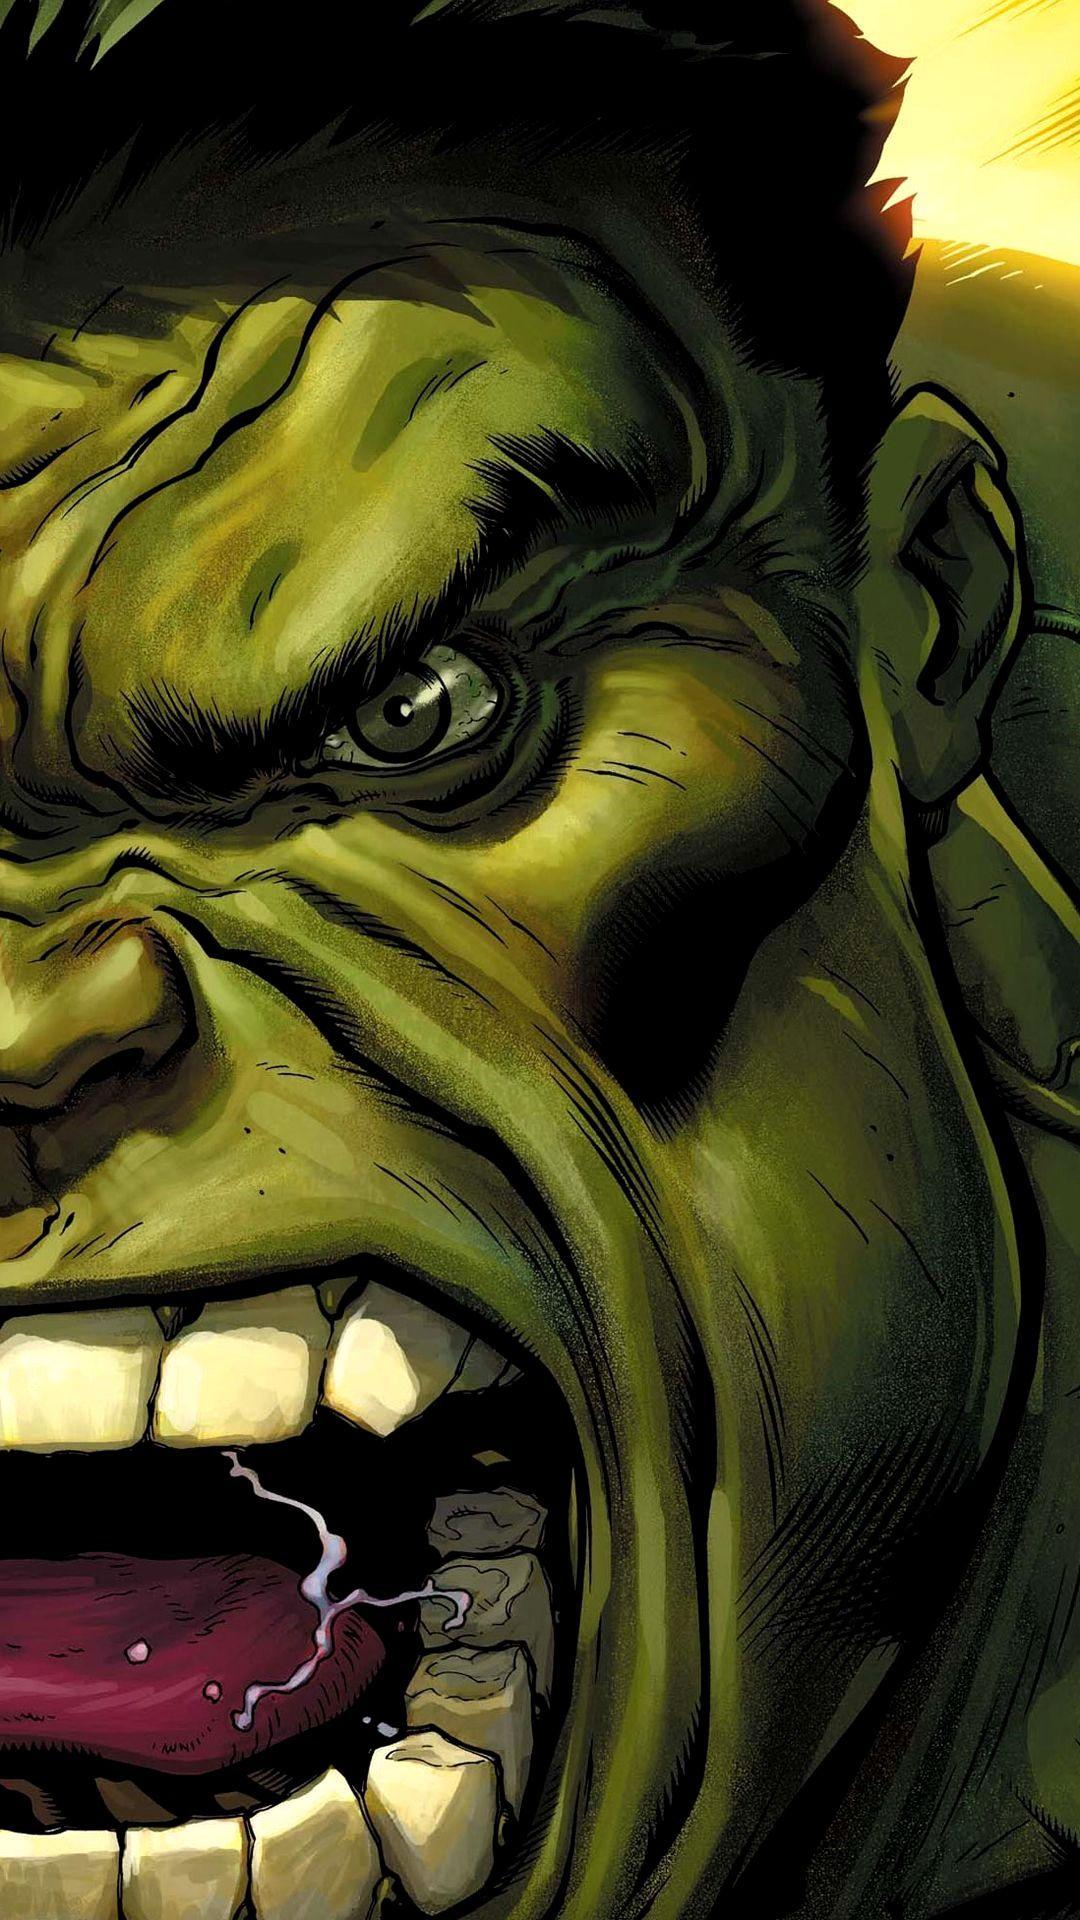 Hulk Wallpaper 4k Iphone Ideas In 2020 Hulk Art Marvel Comics Wallpaper Hulk Comic